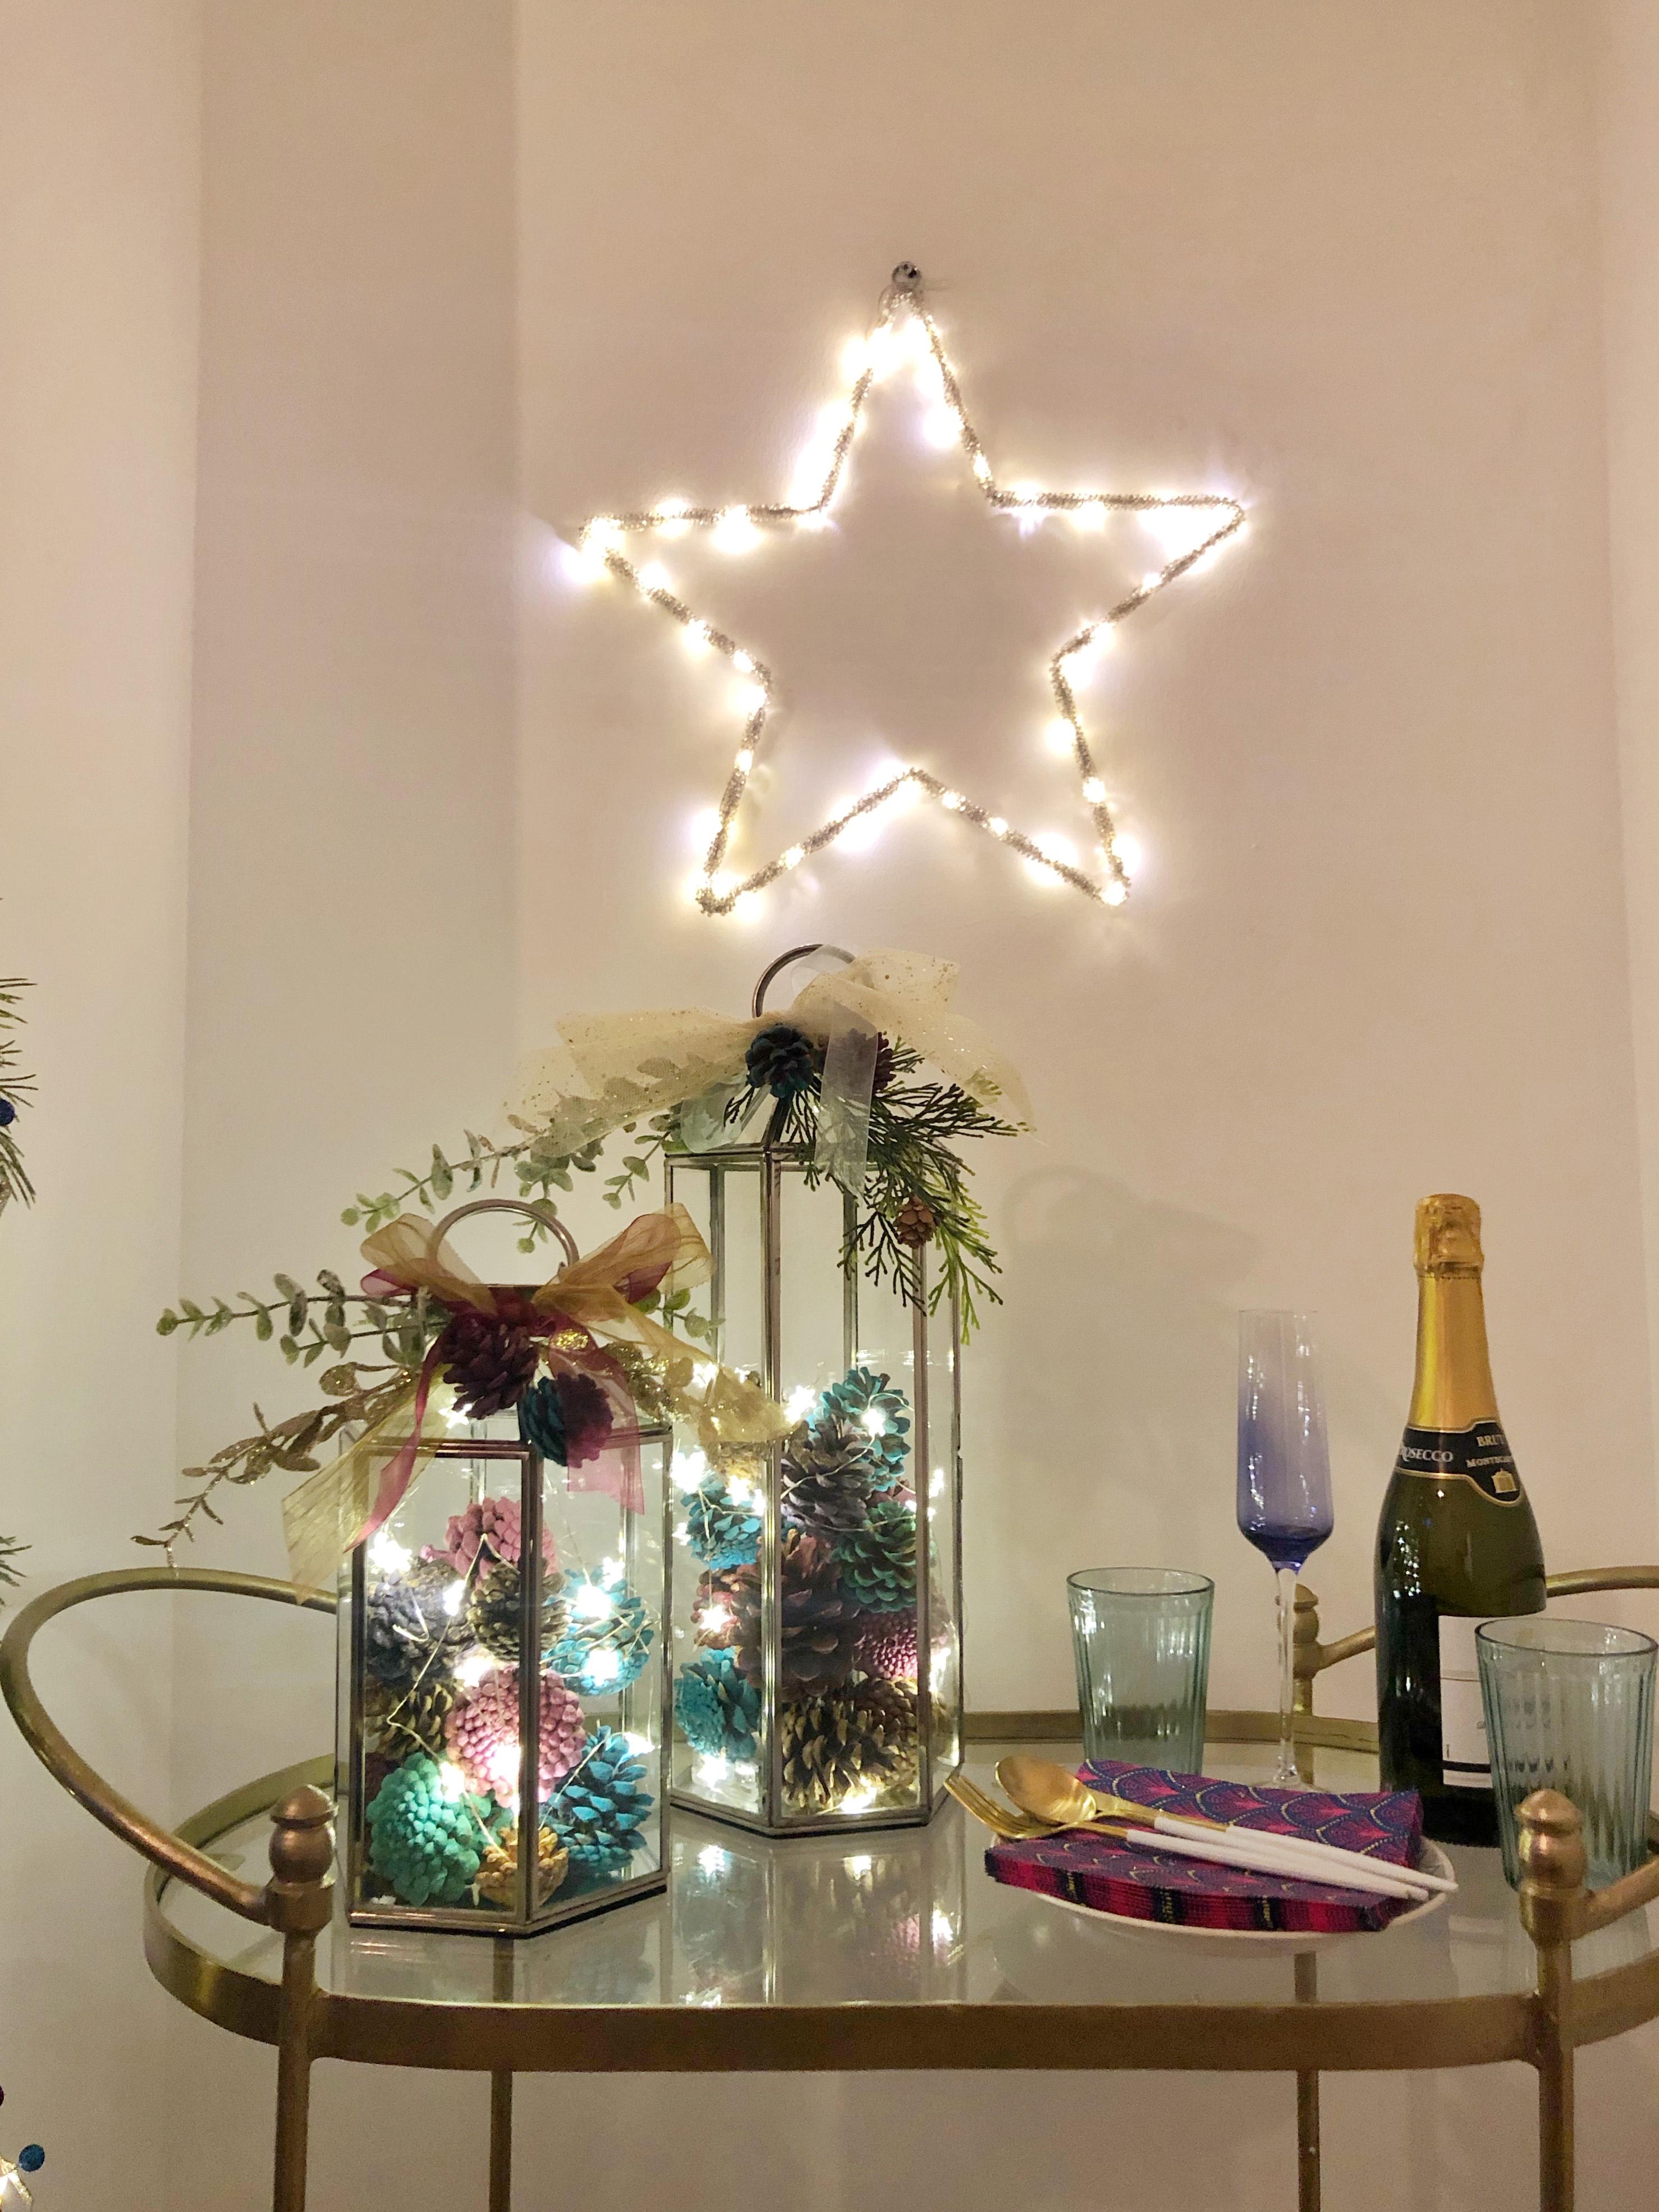 How to make a Christmas Lantern